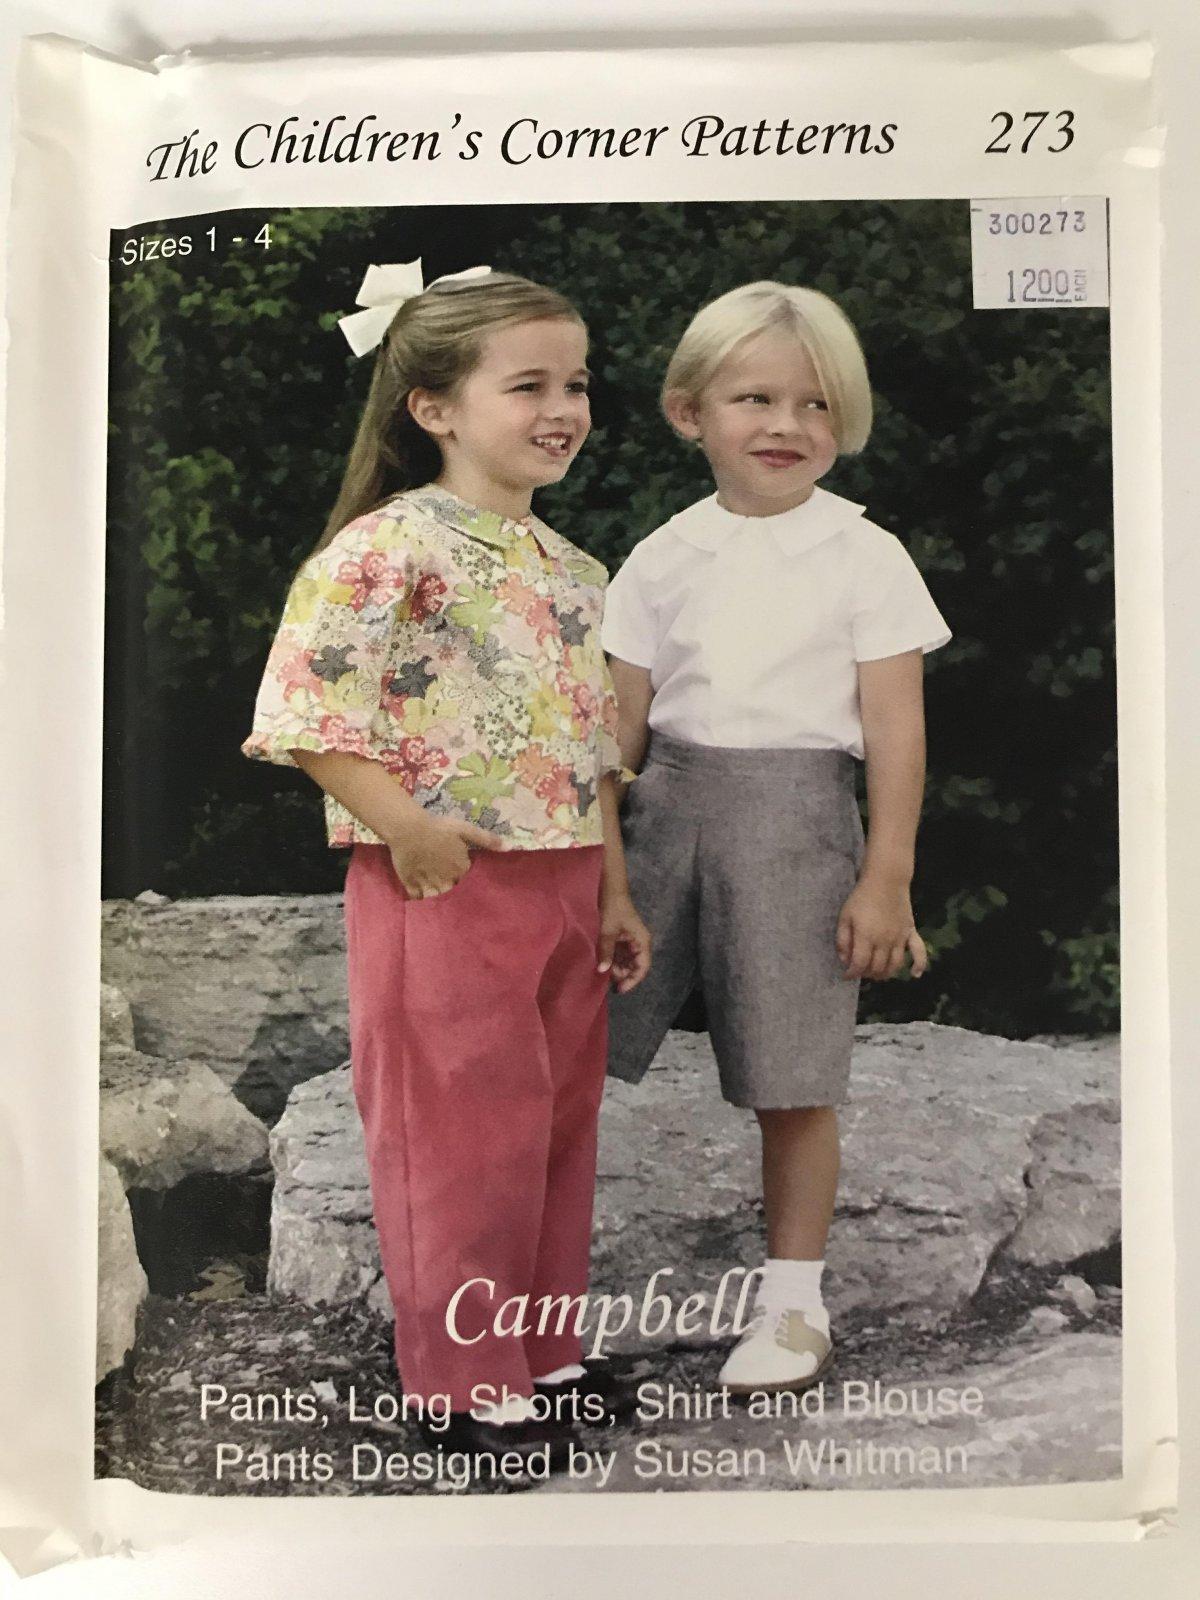 CHILDREN'S CORNER CAMPBELL